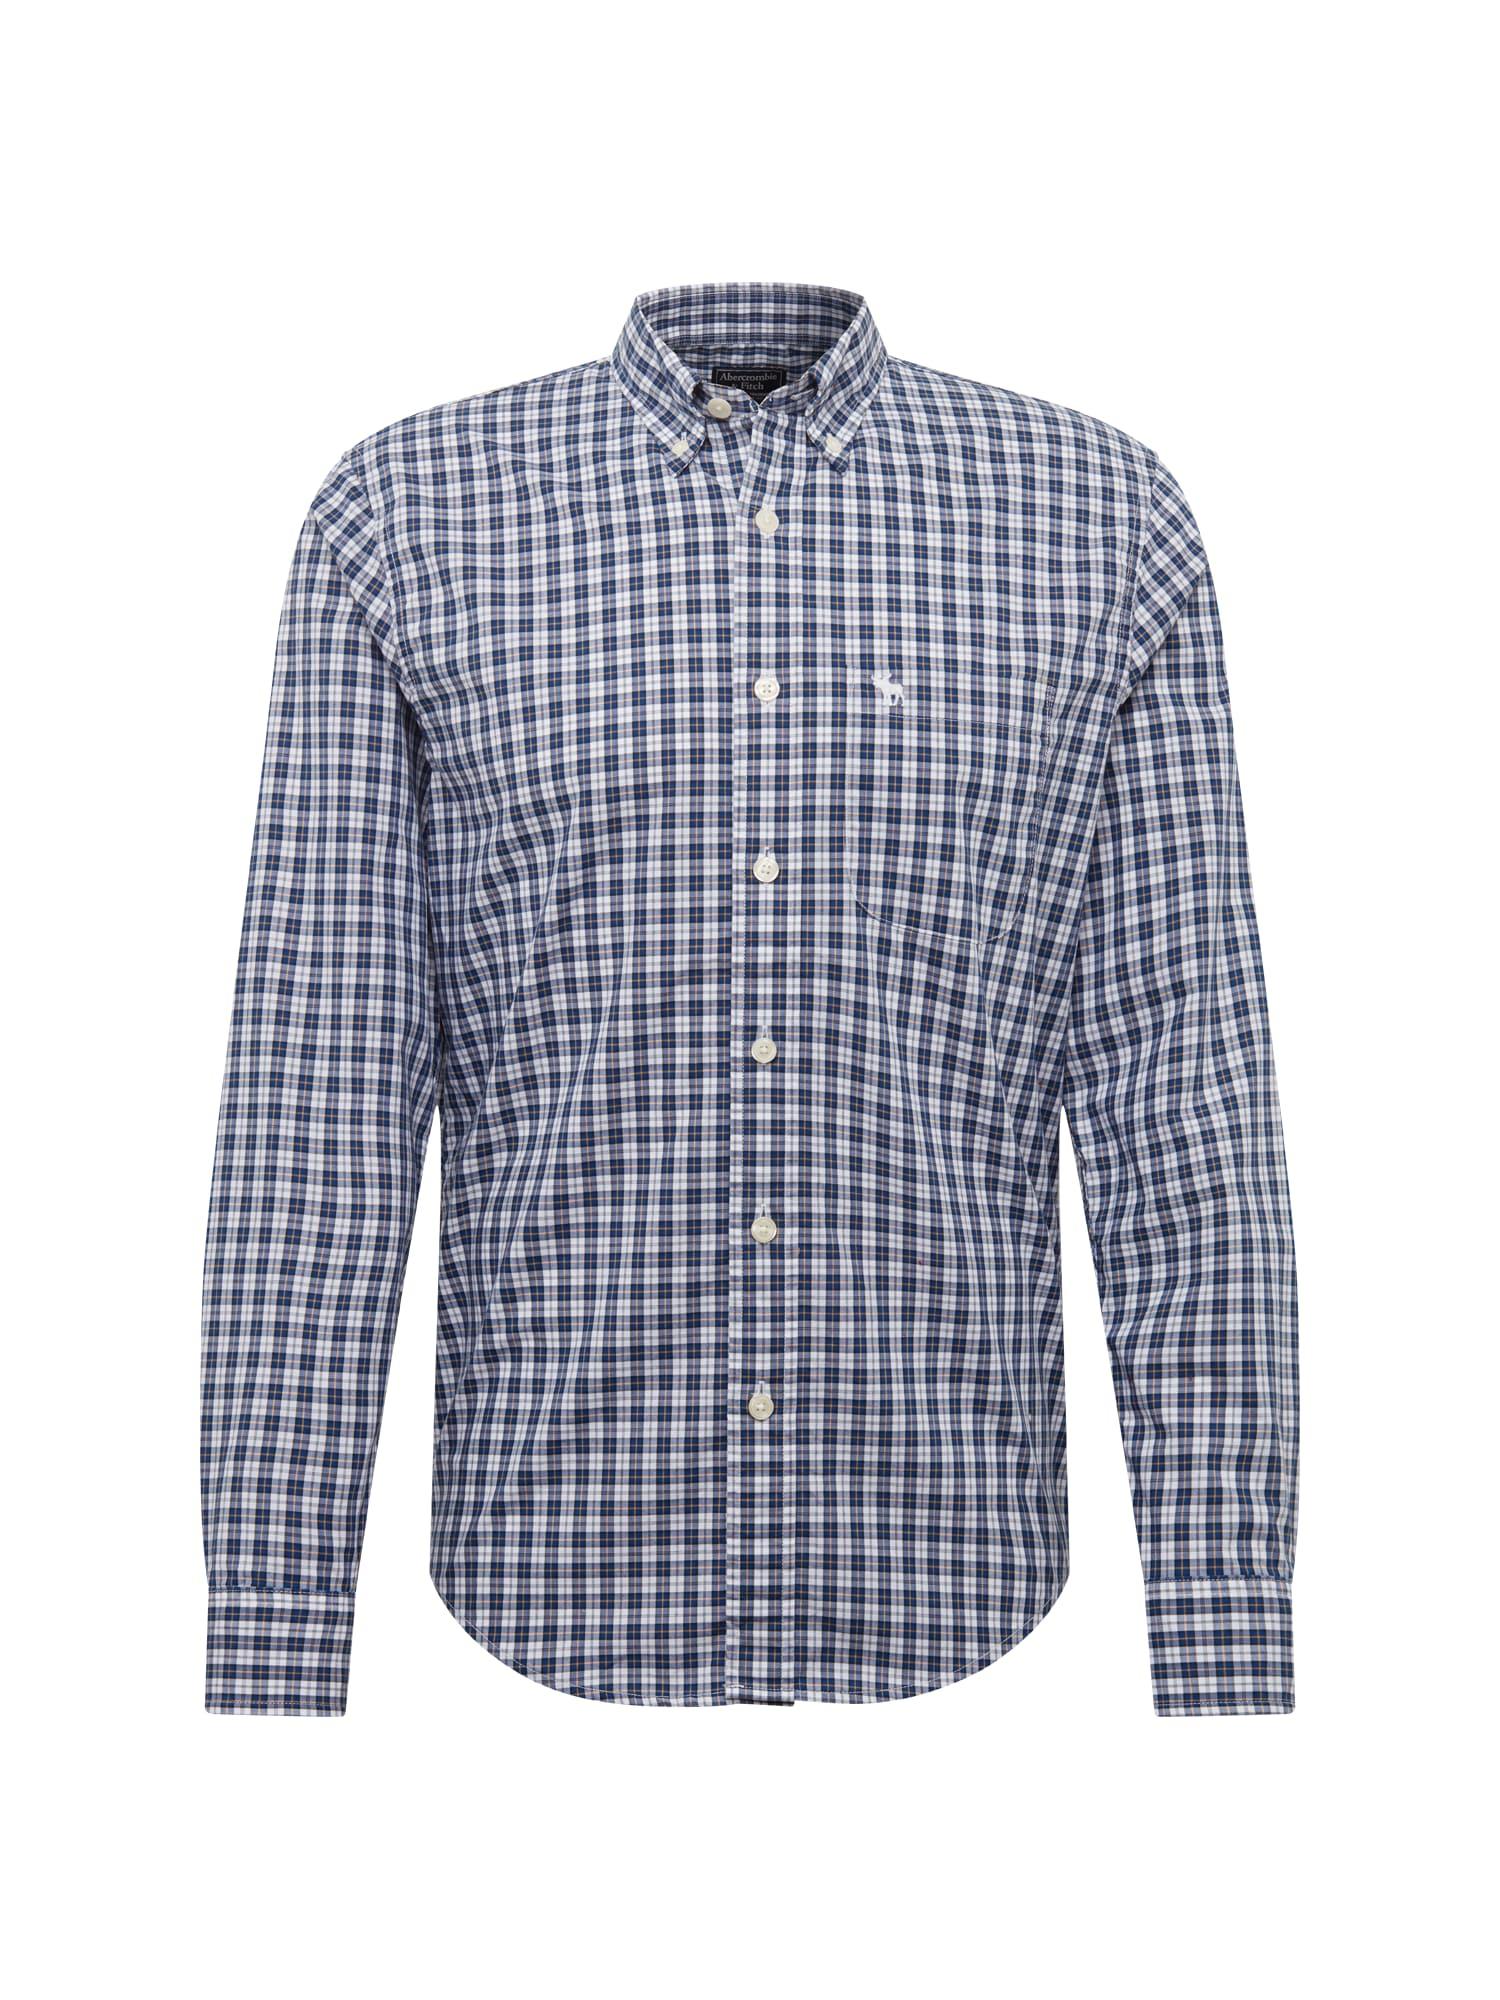 Košile ICON CORE FASHION POPLIN CCMD 3CC modrá Abercrombie & Fitch